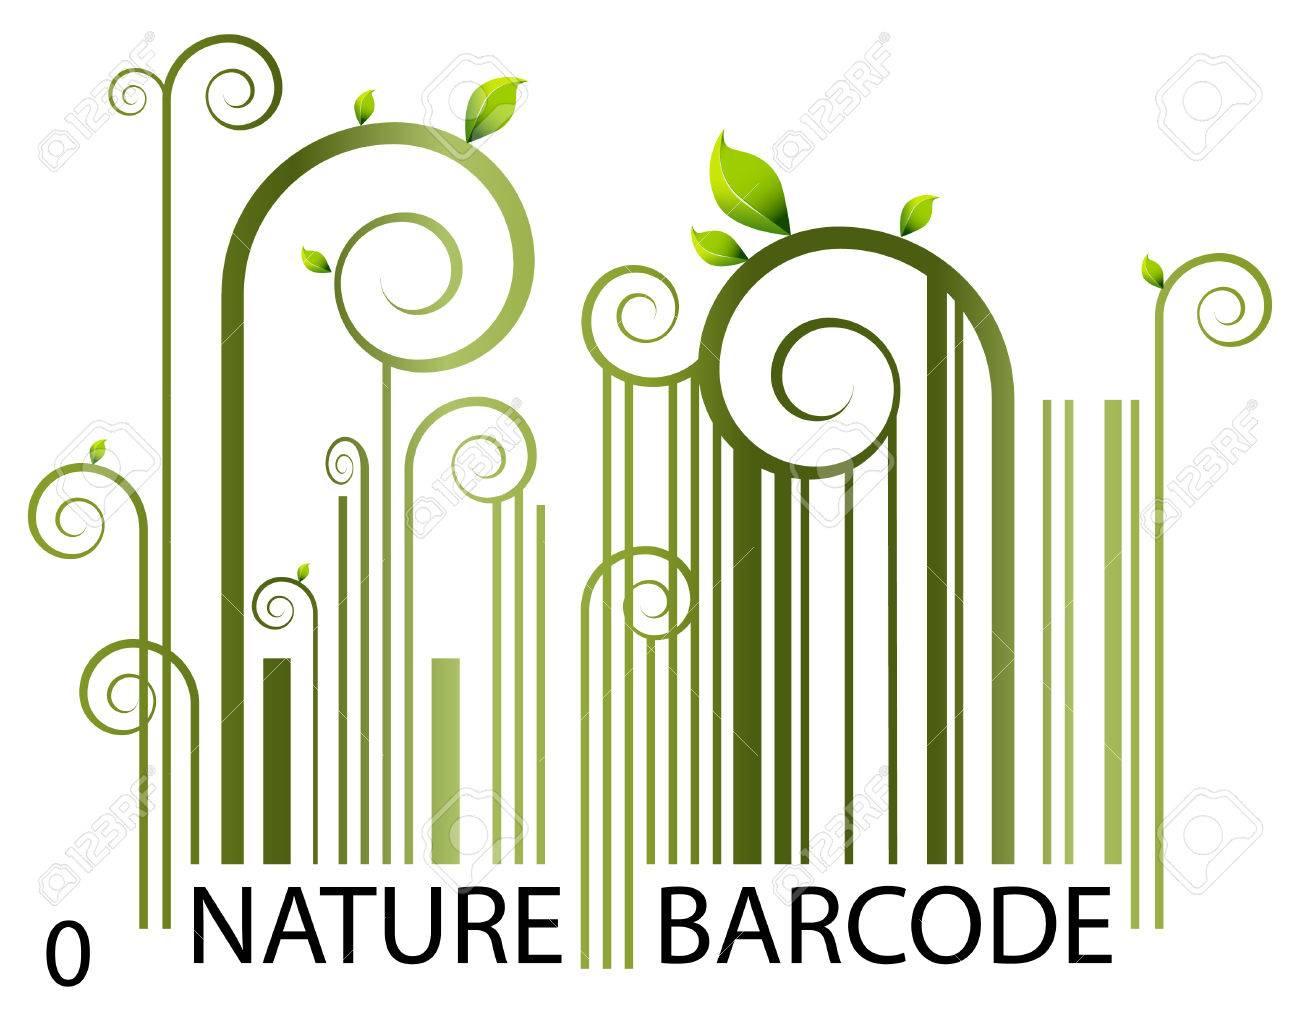 Nature Barcode Stock Vector - 7559574